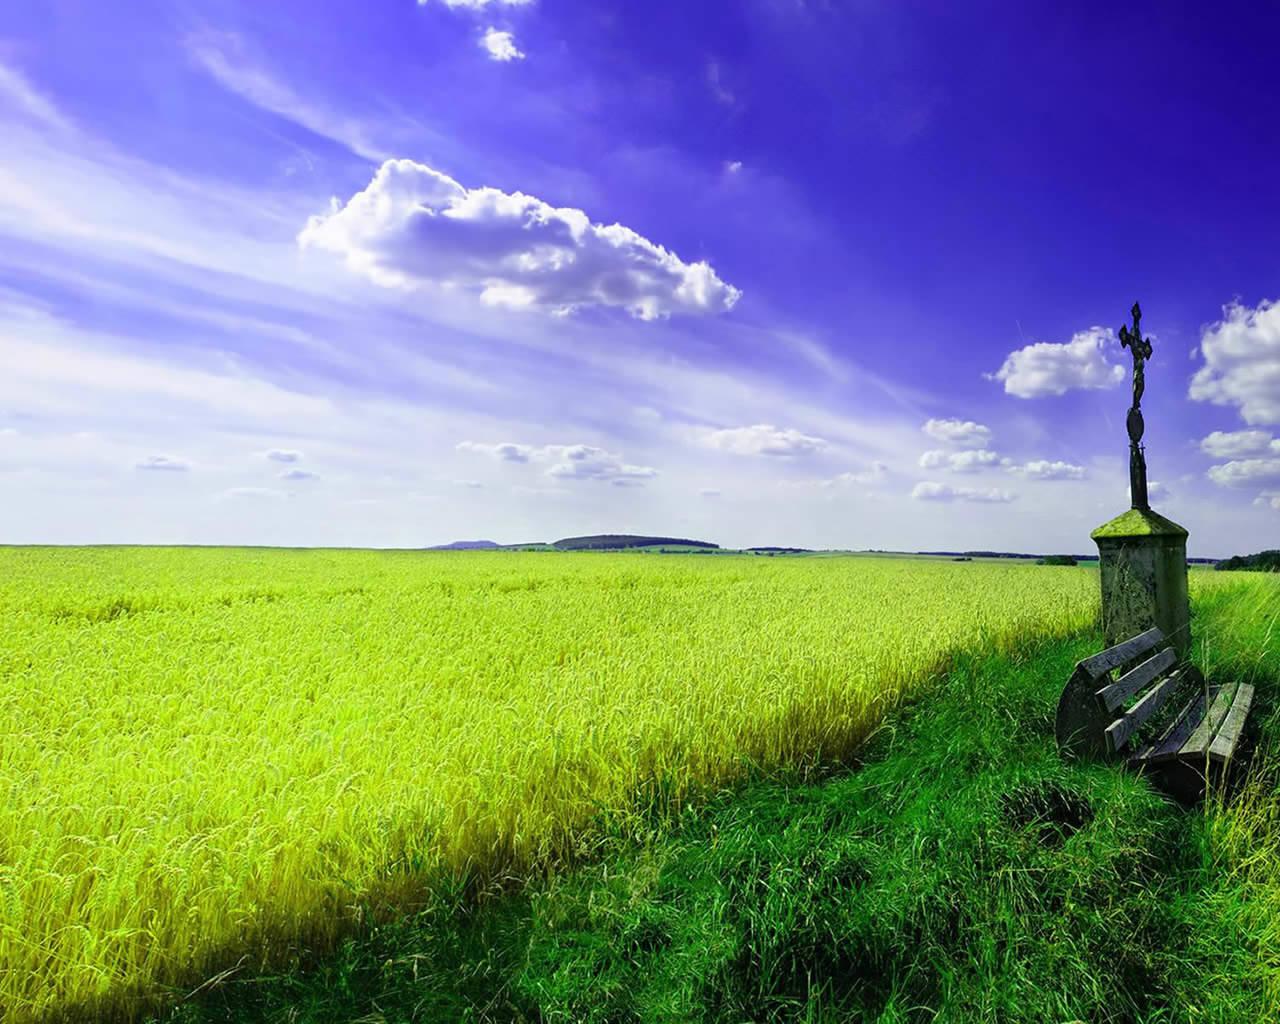 Spring Scenery Vector Download 1280x1024